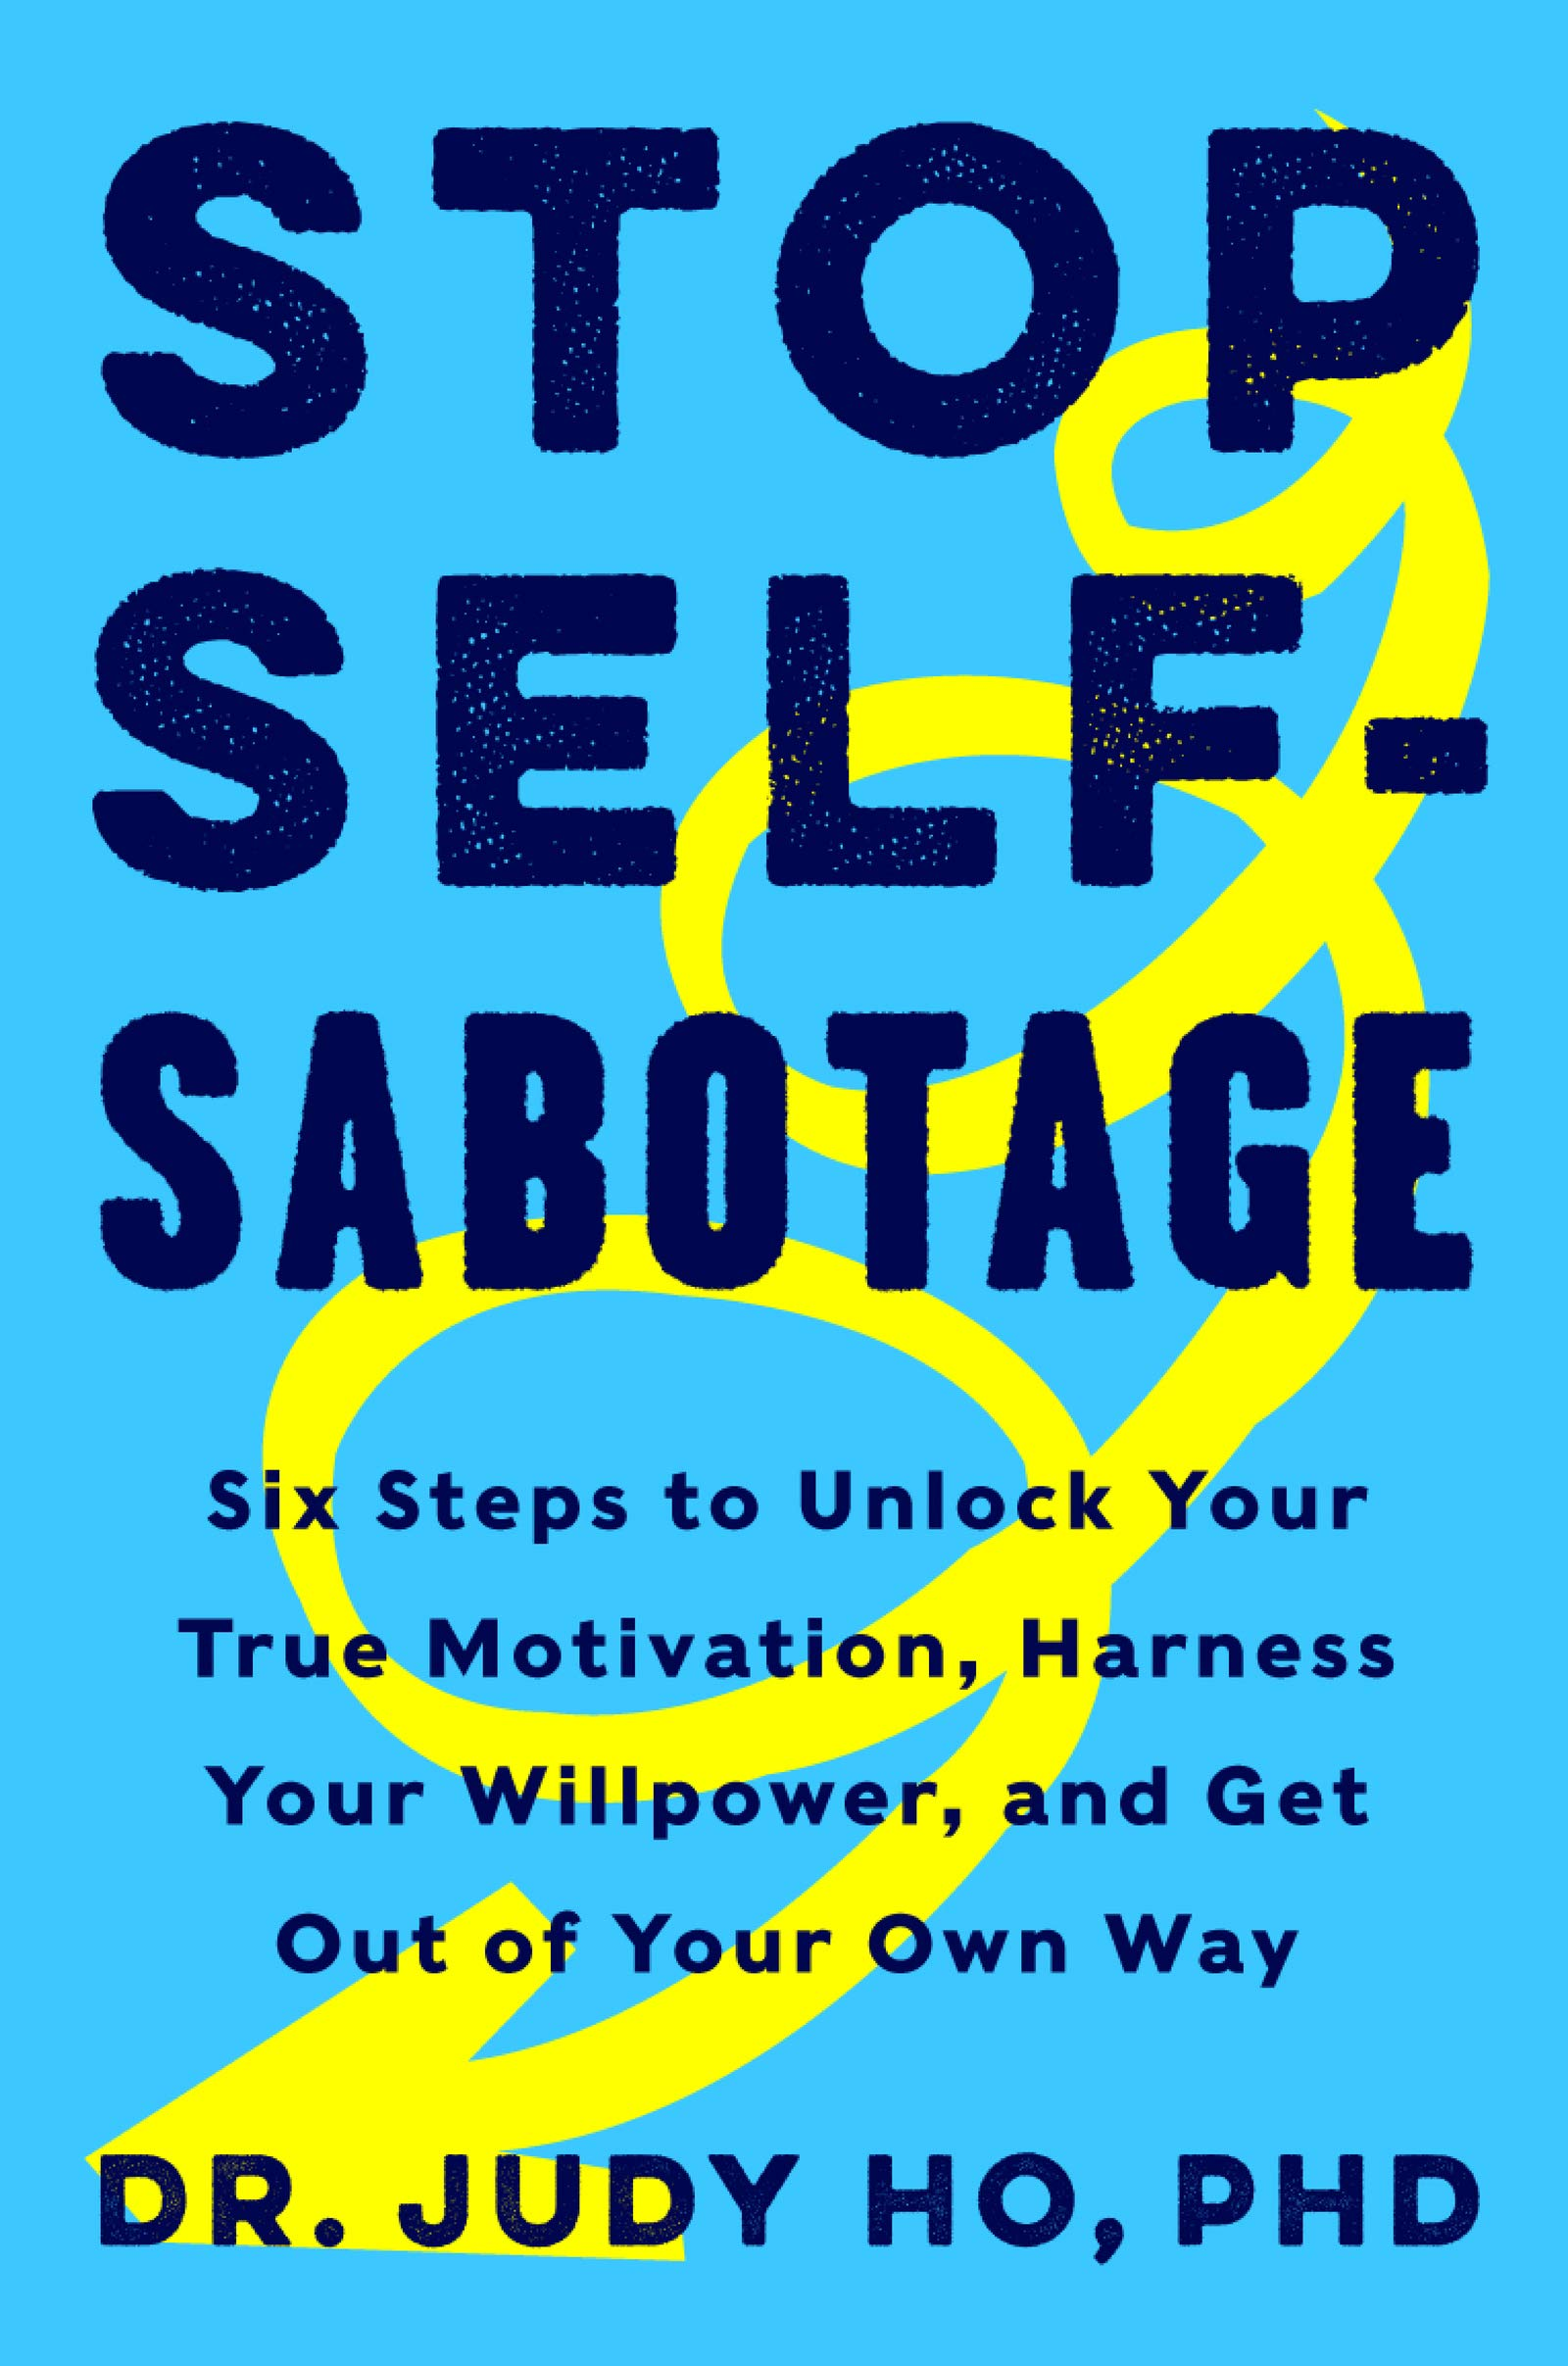 Self sabotaging relationship behaviors